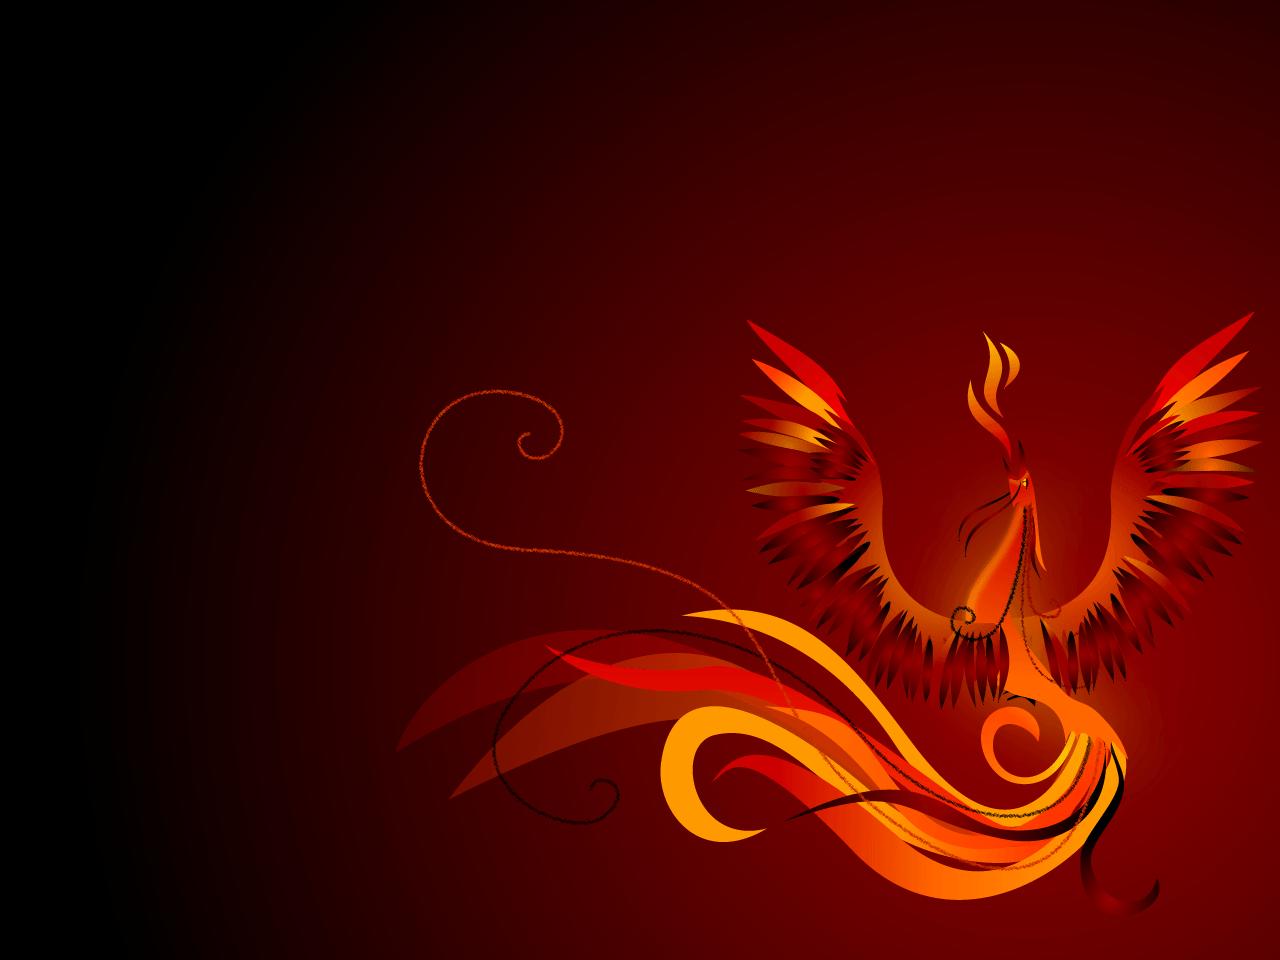 phoenix wallpaper hd - photo #31